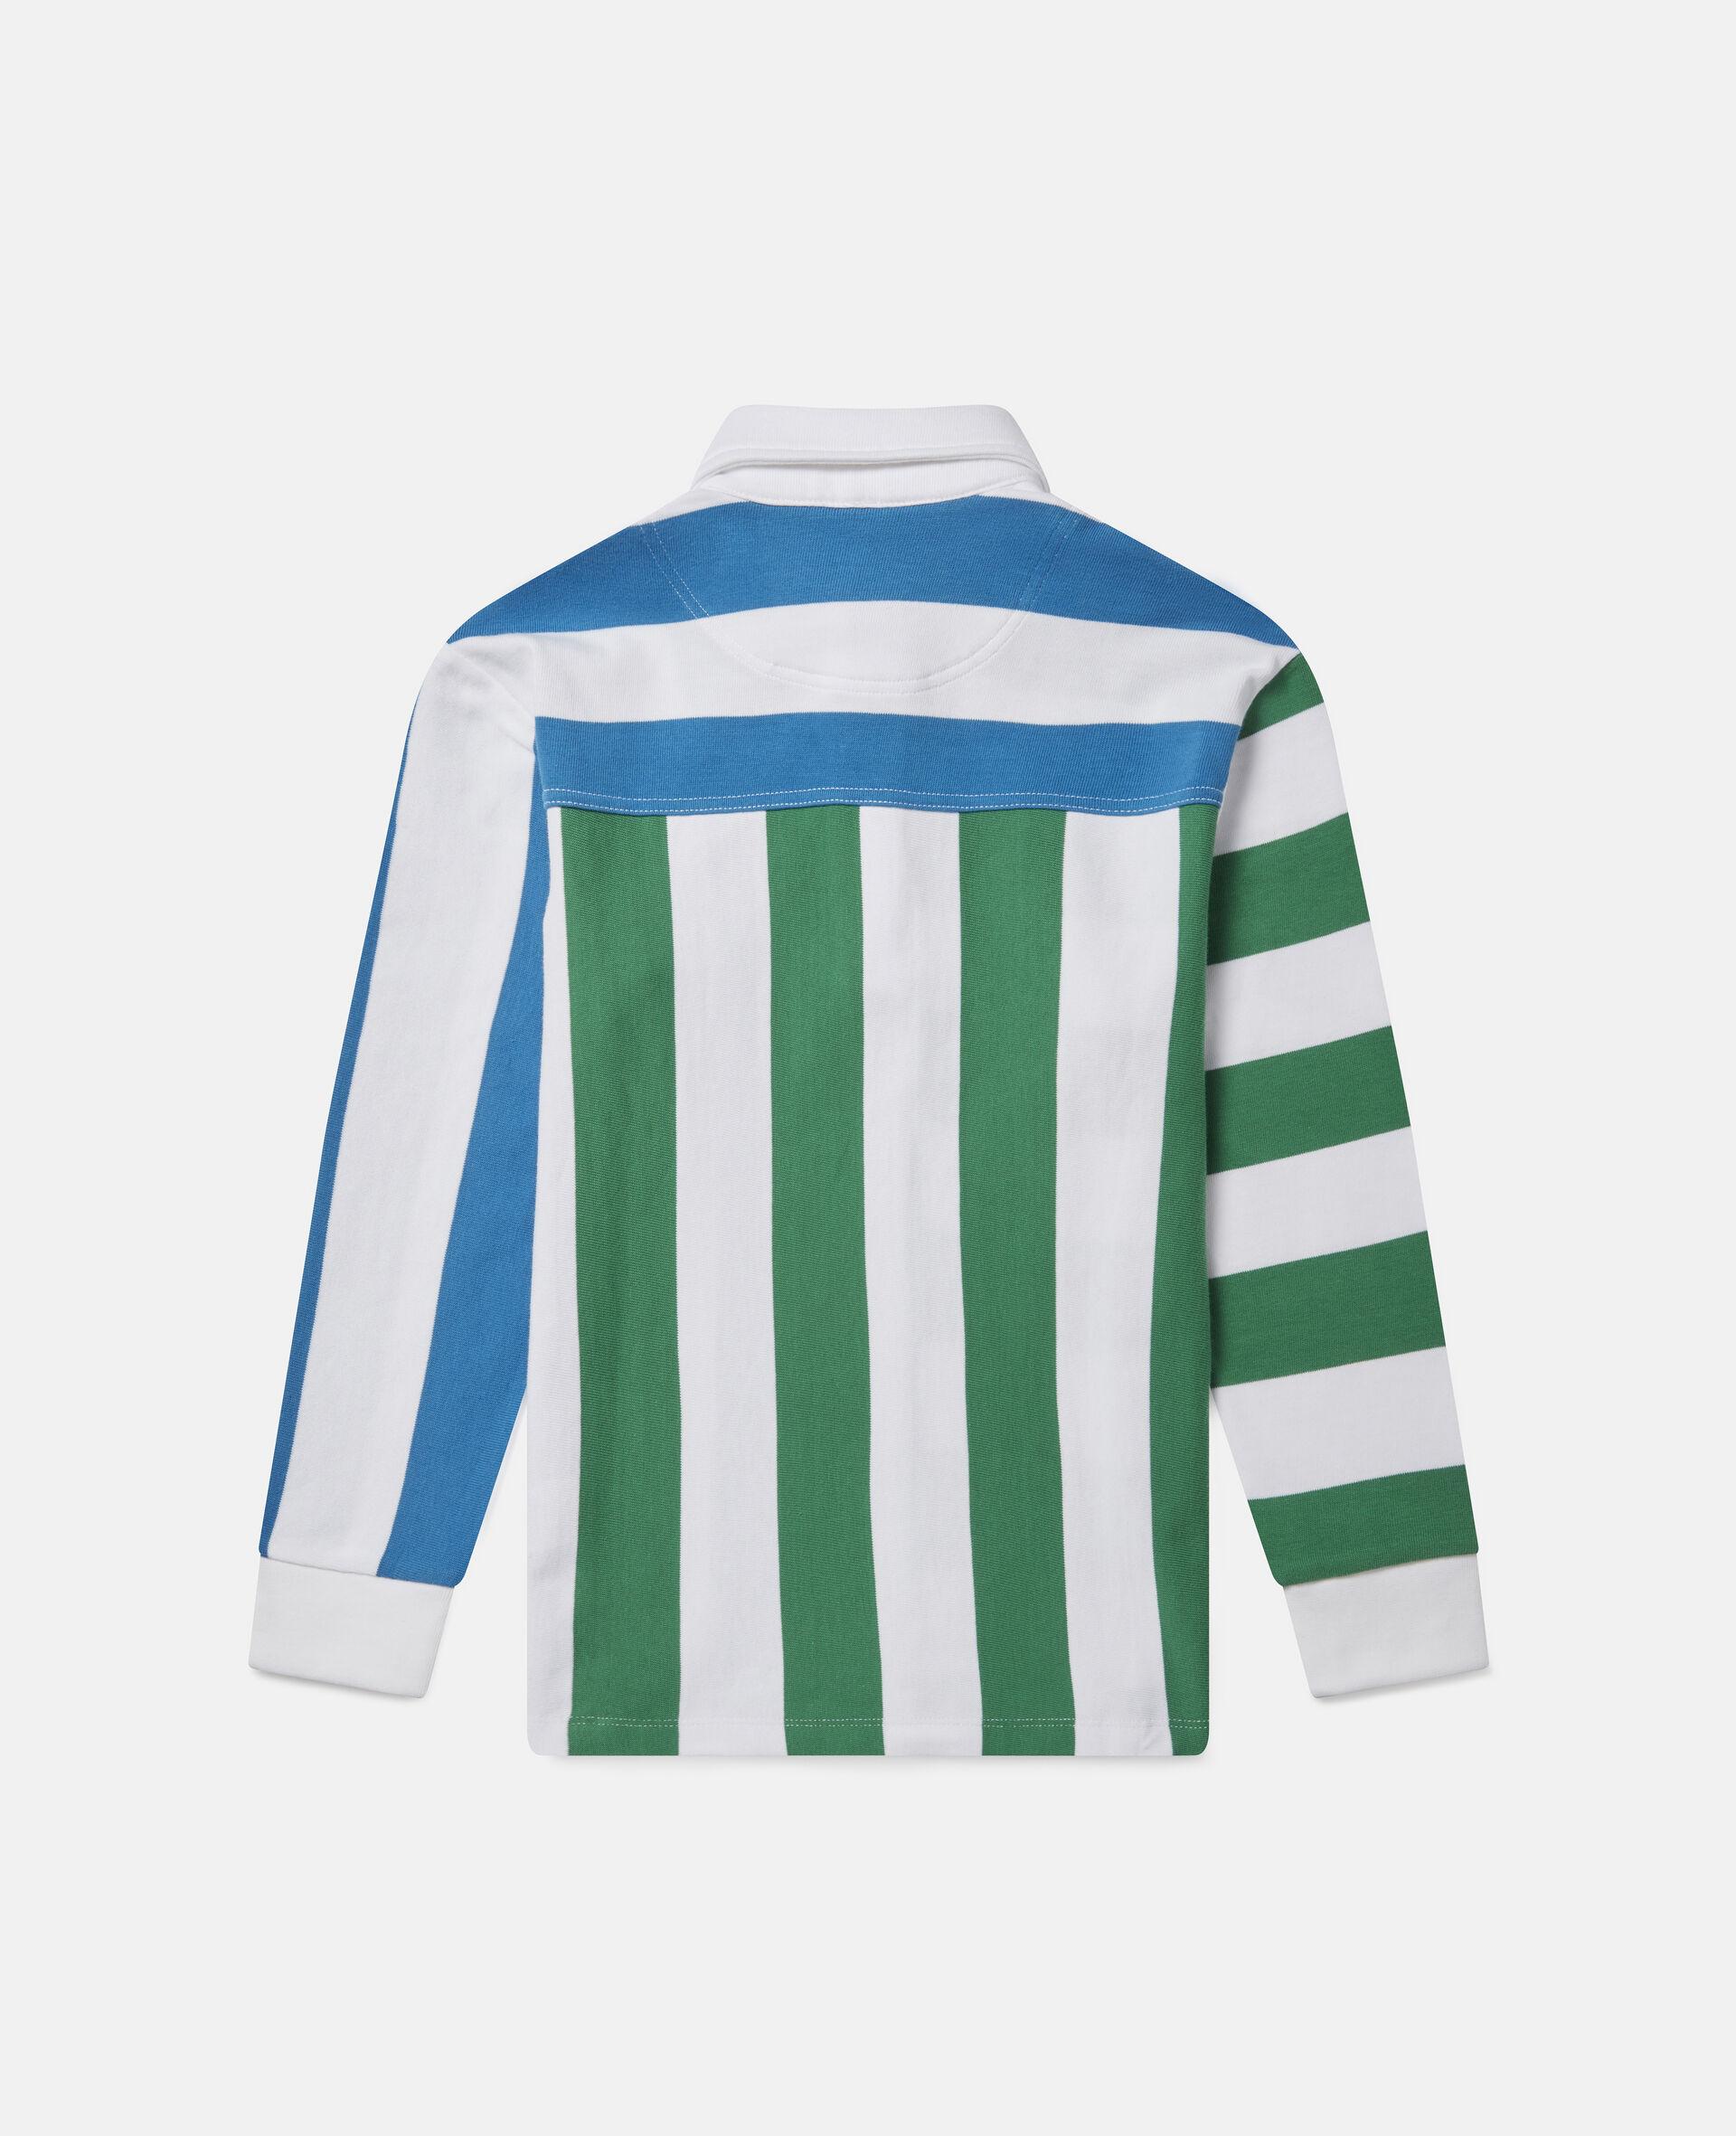 Übergroße gestreifte Hemdbluse im Blockfarben-Design-Bunt-large image number 2